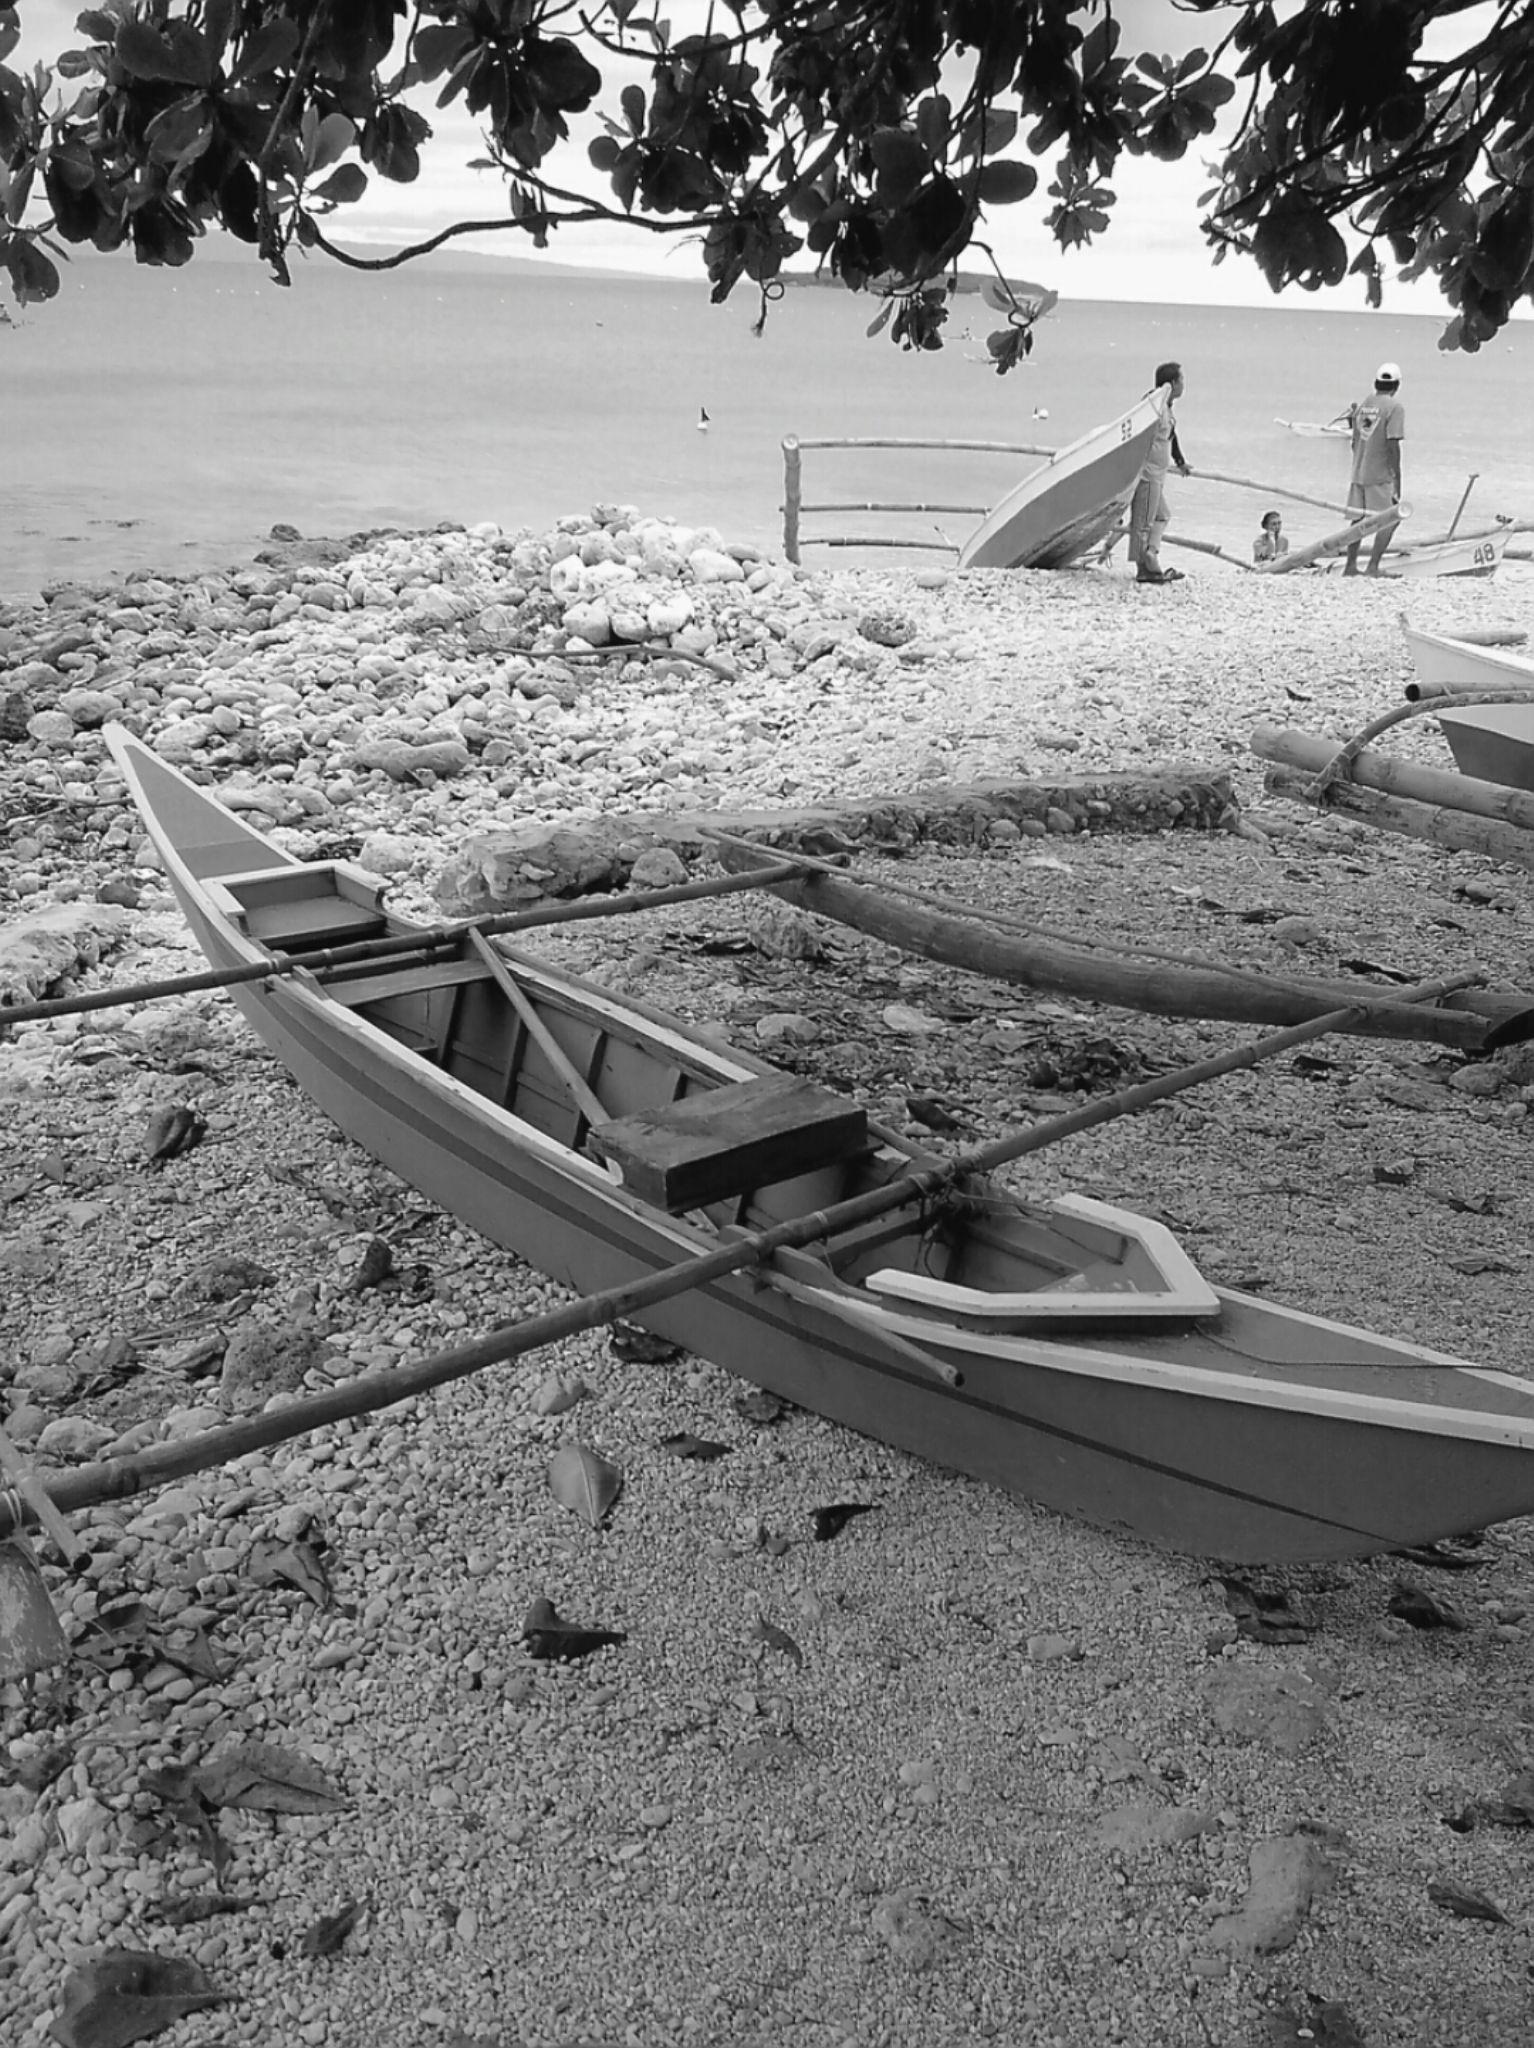 Fisherman's Boat by jssacaben